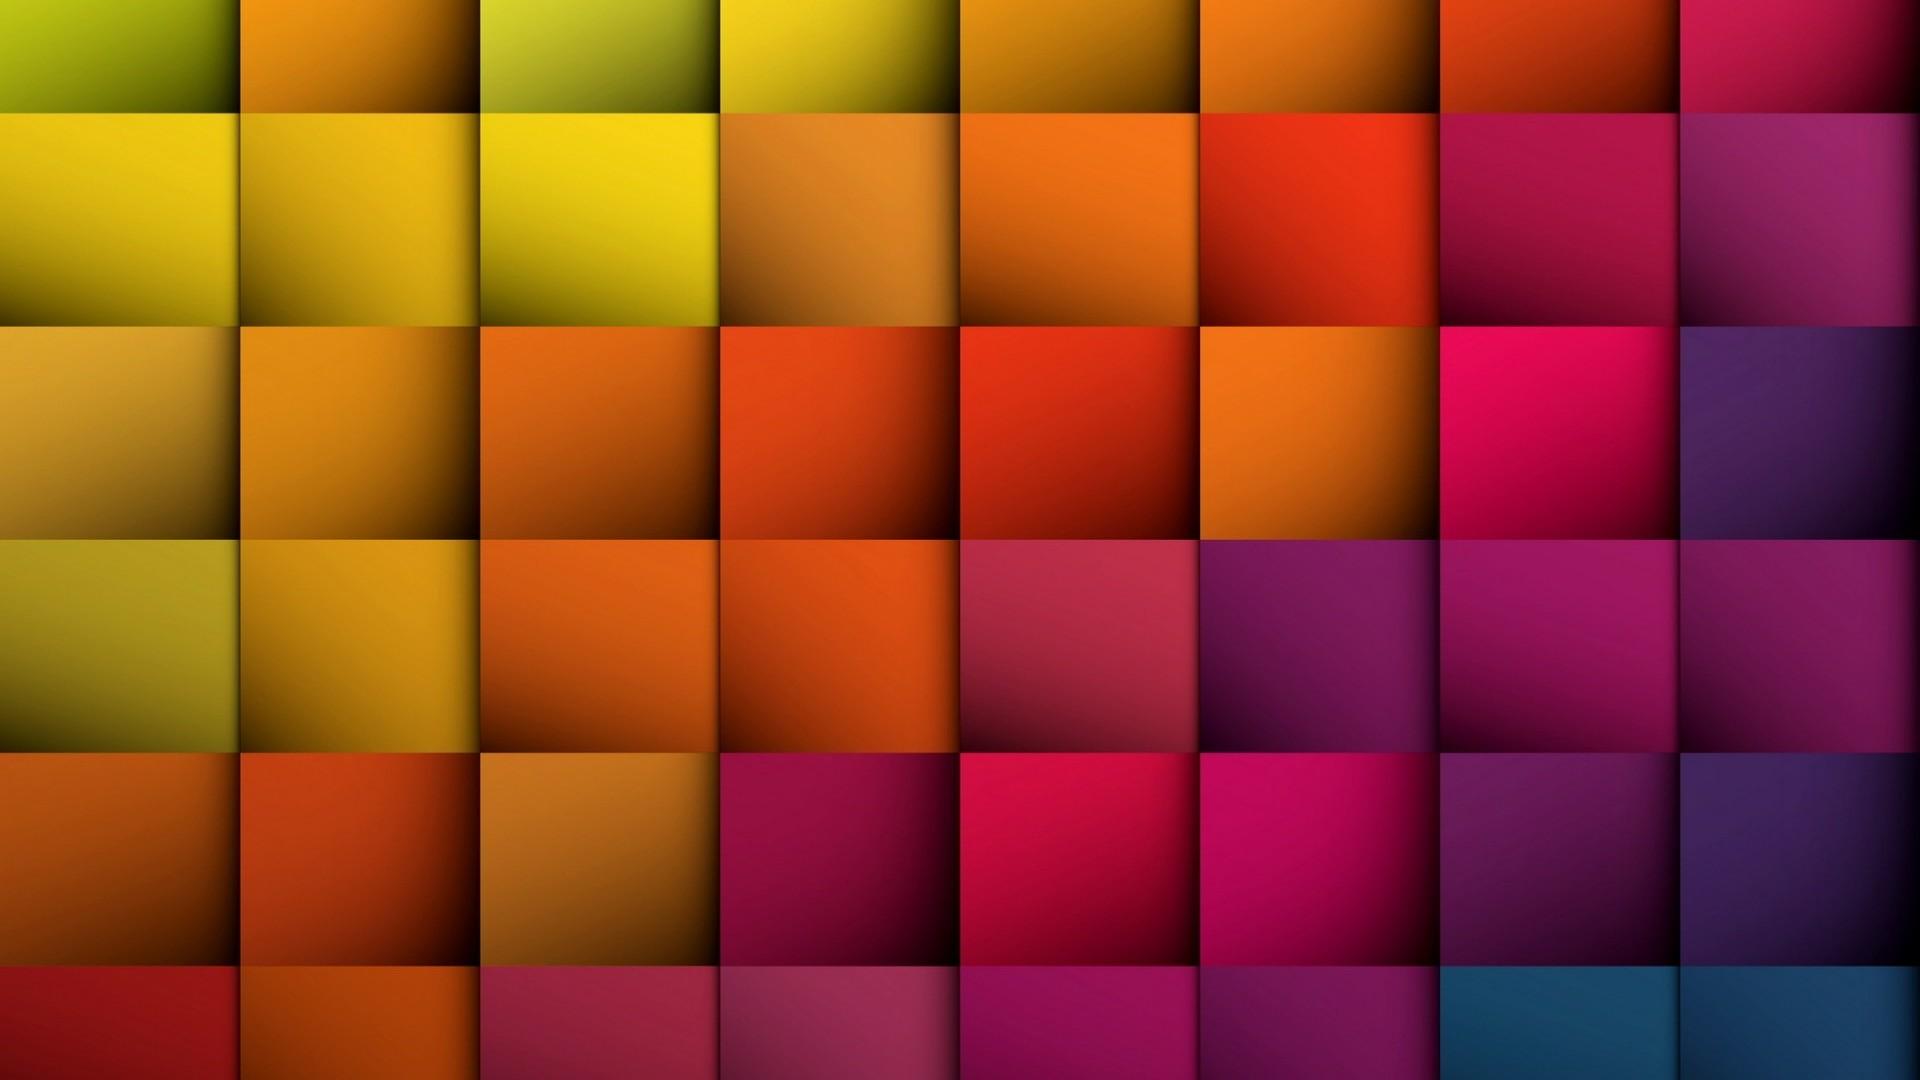 984346 beautiful color hd wallpaper 1920x1080 for windows 10